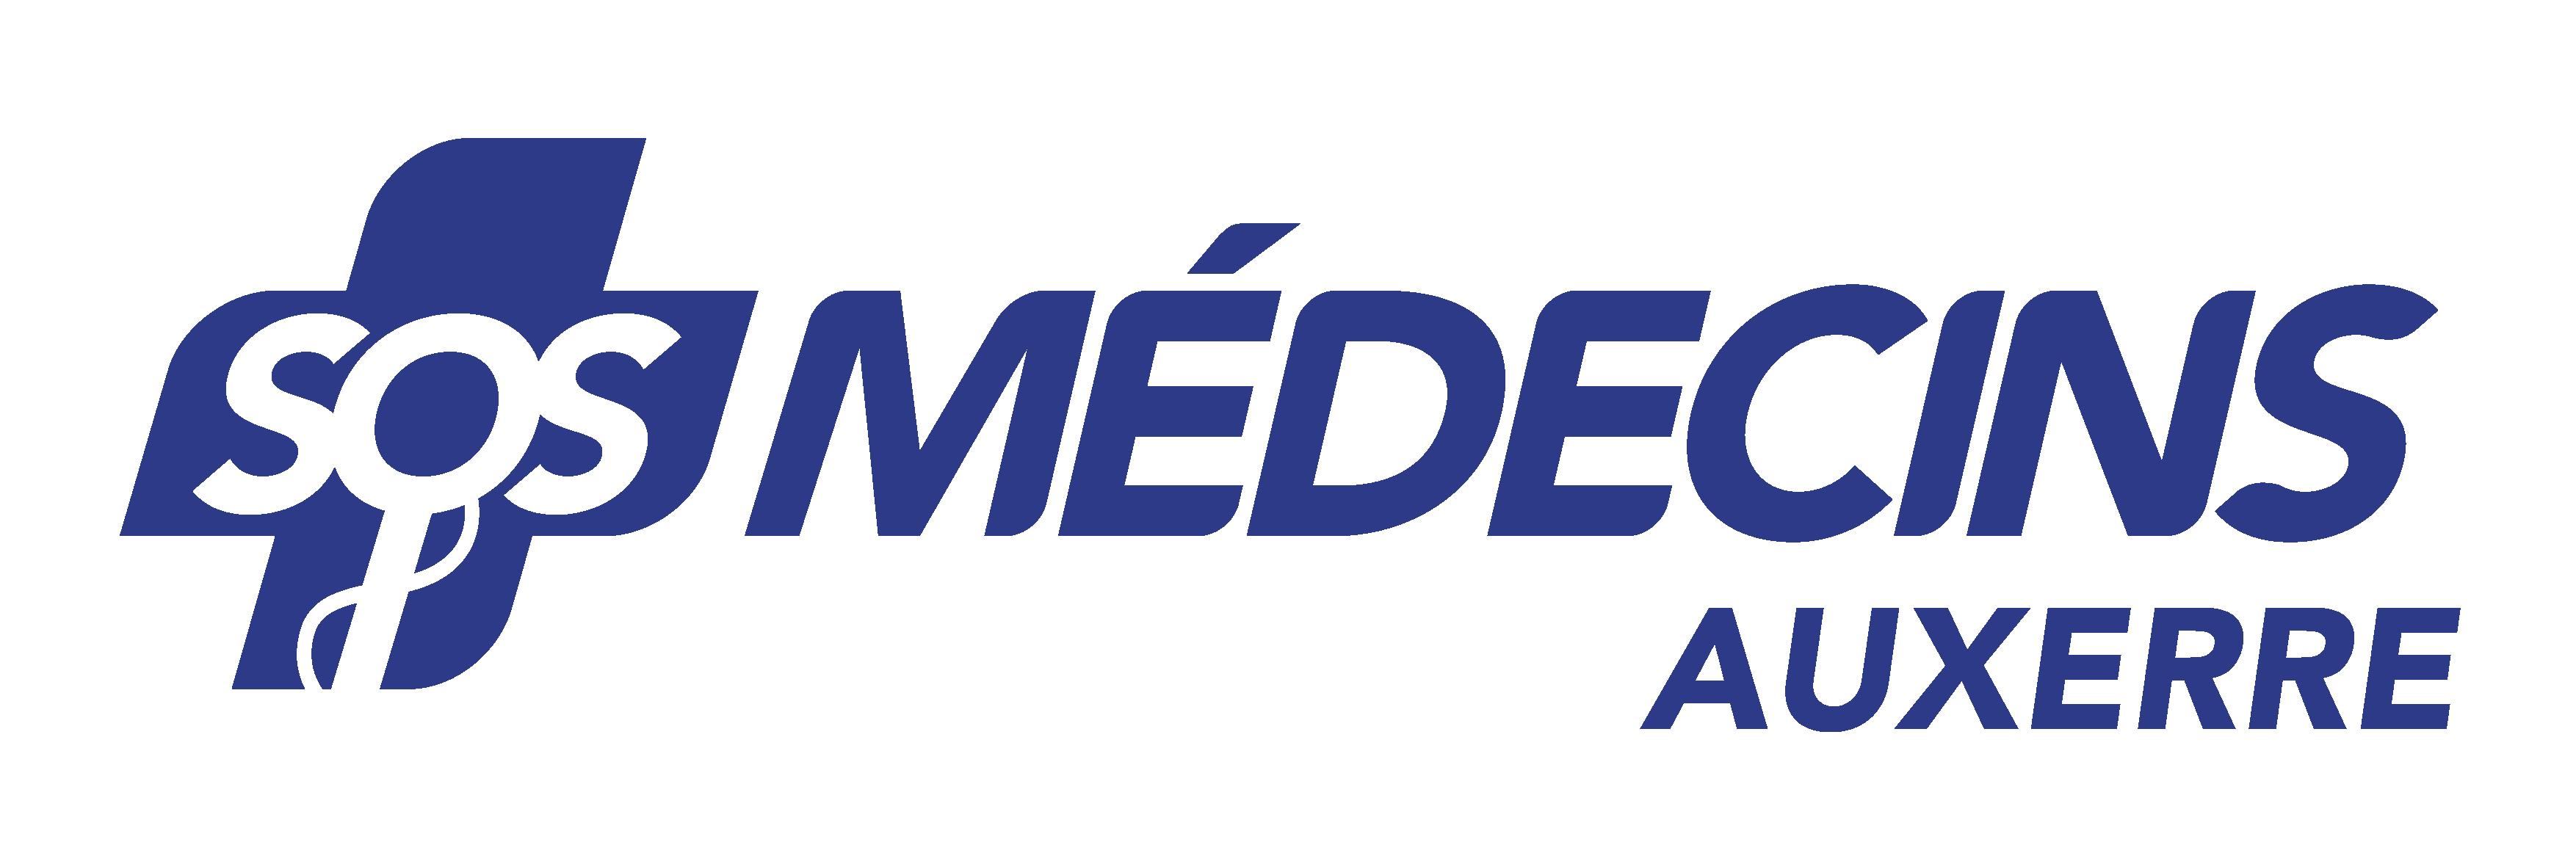 SOS Médecins Auxerre